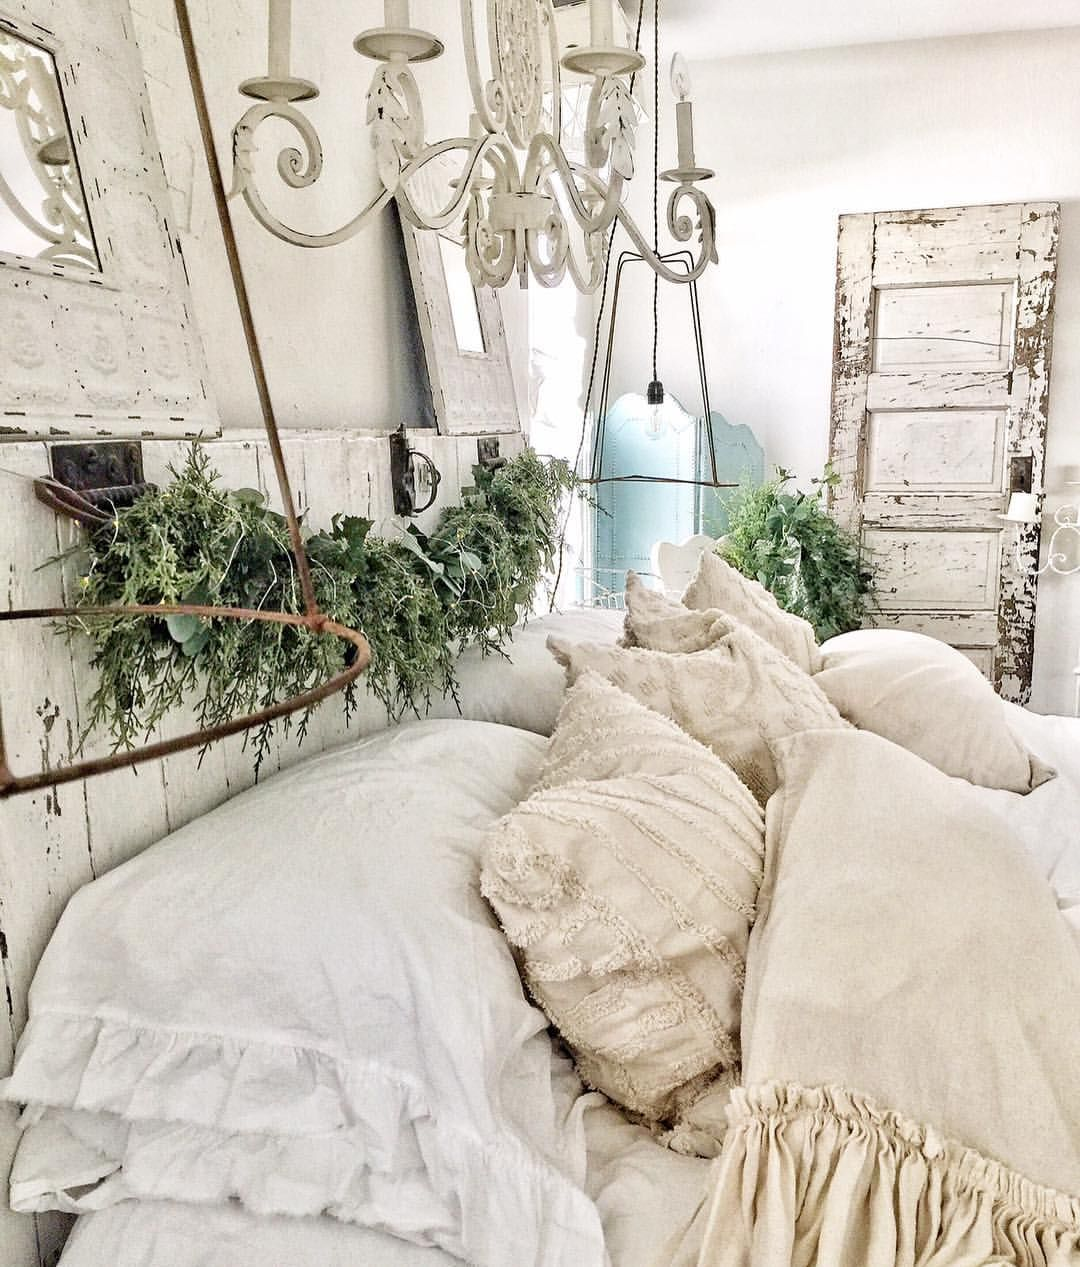 Pin de Pamela Sickman en Bed \'n Bath | Pinterest | Paletas